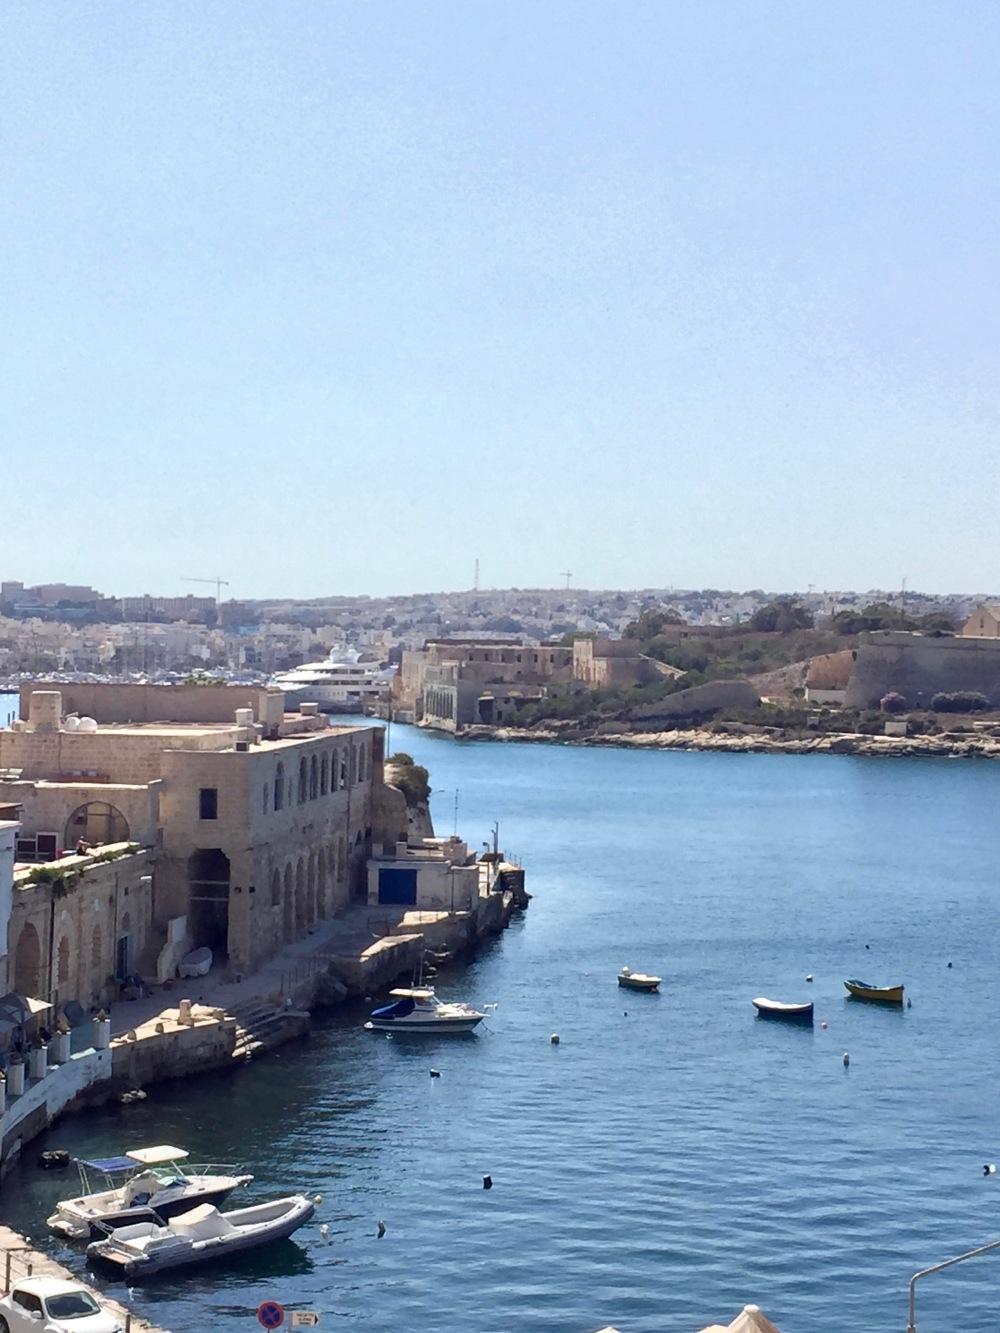 You keep me on guard, Malta.